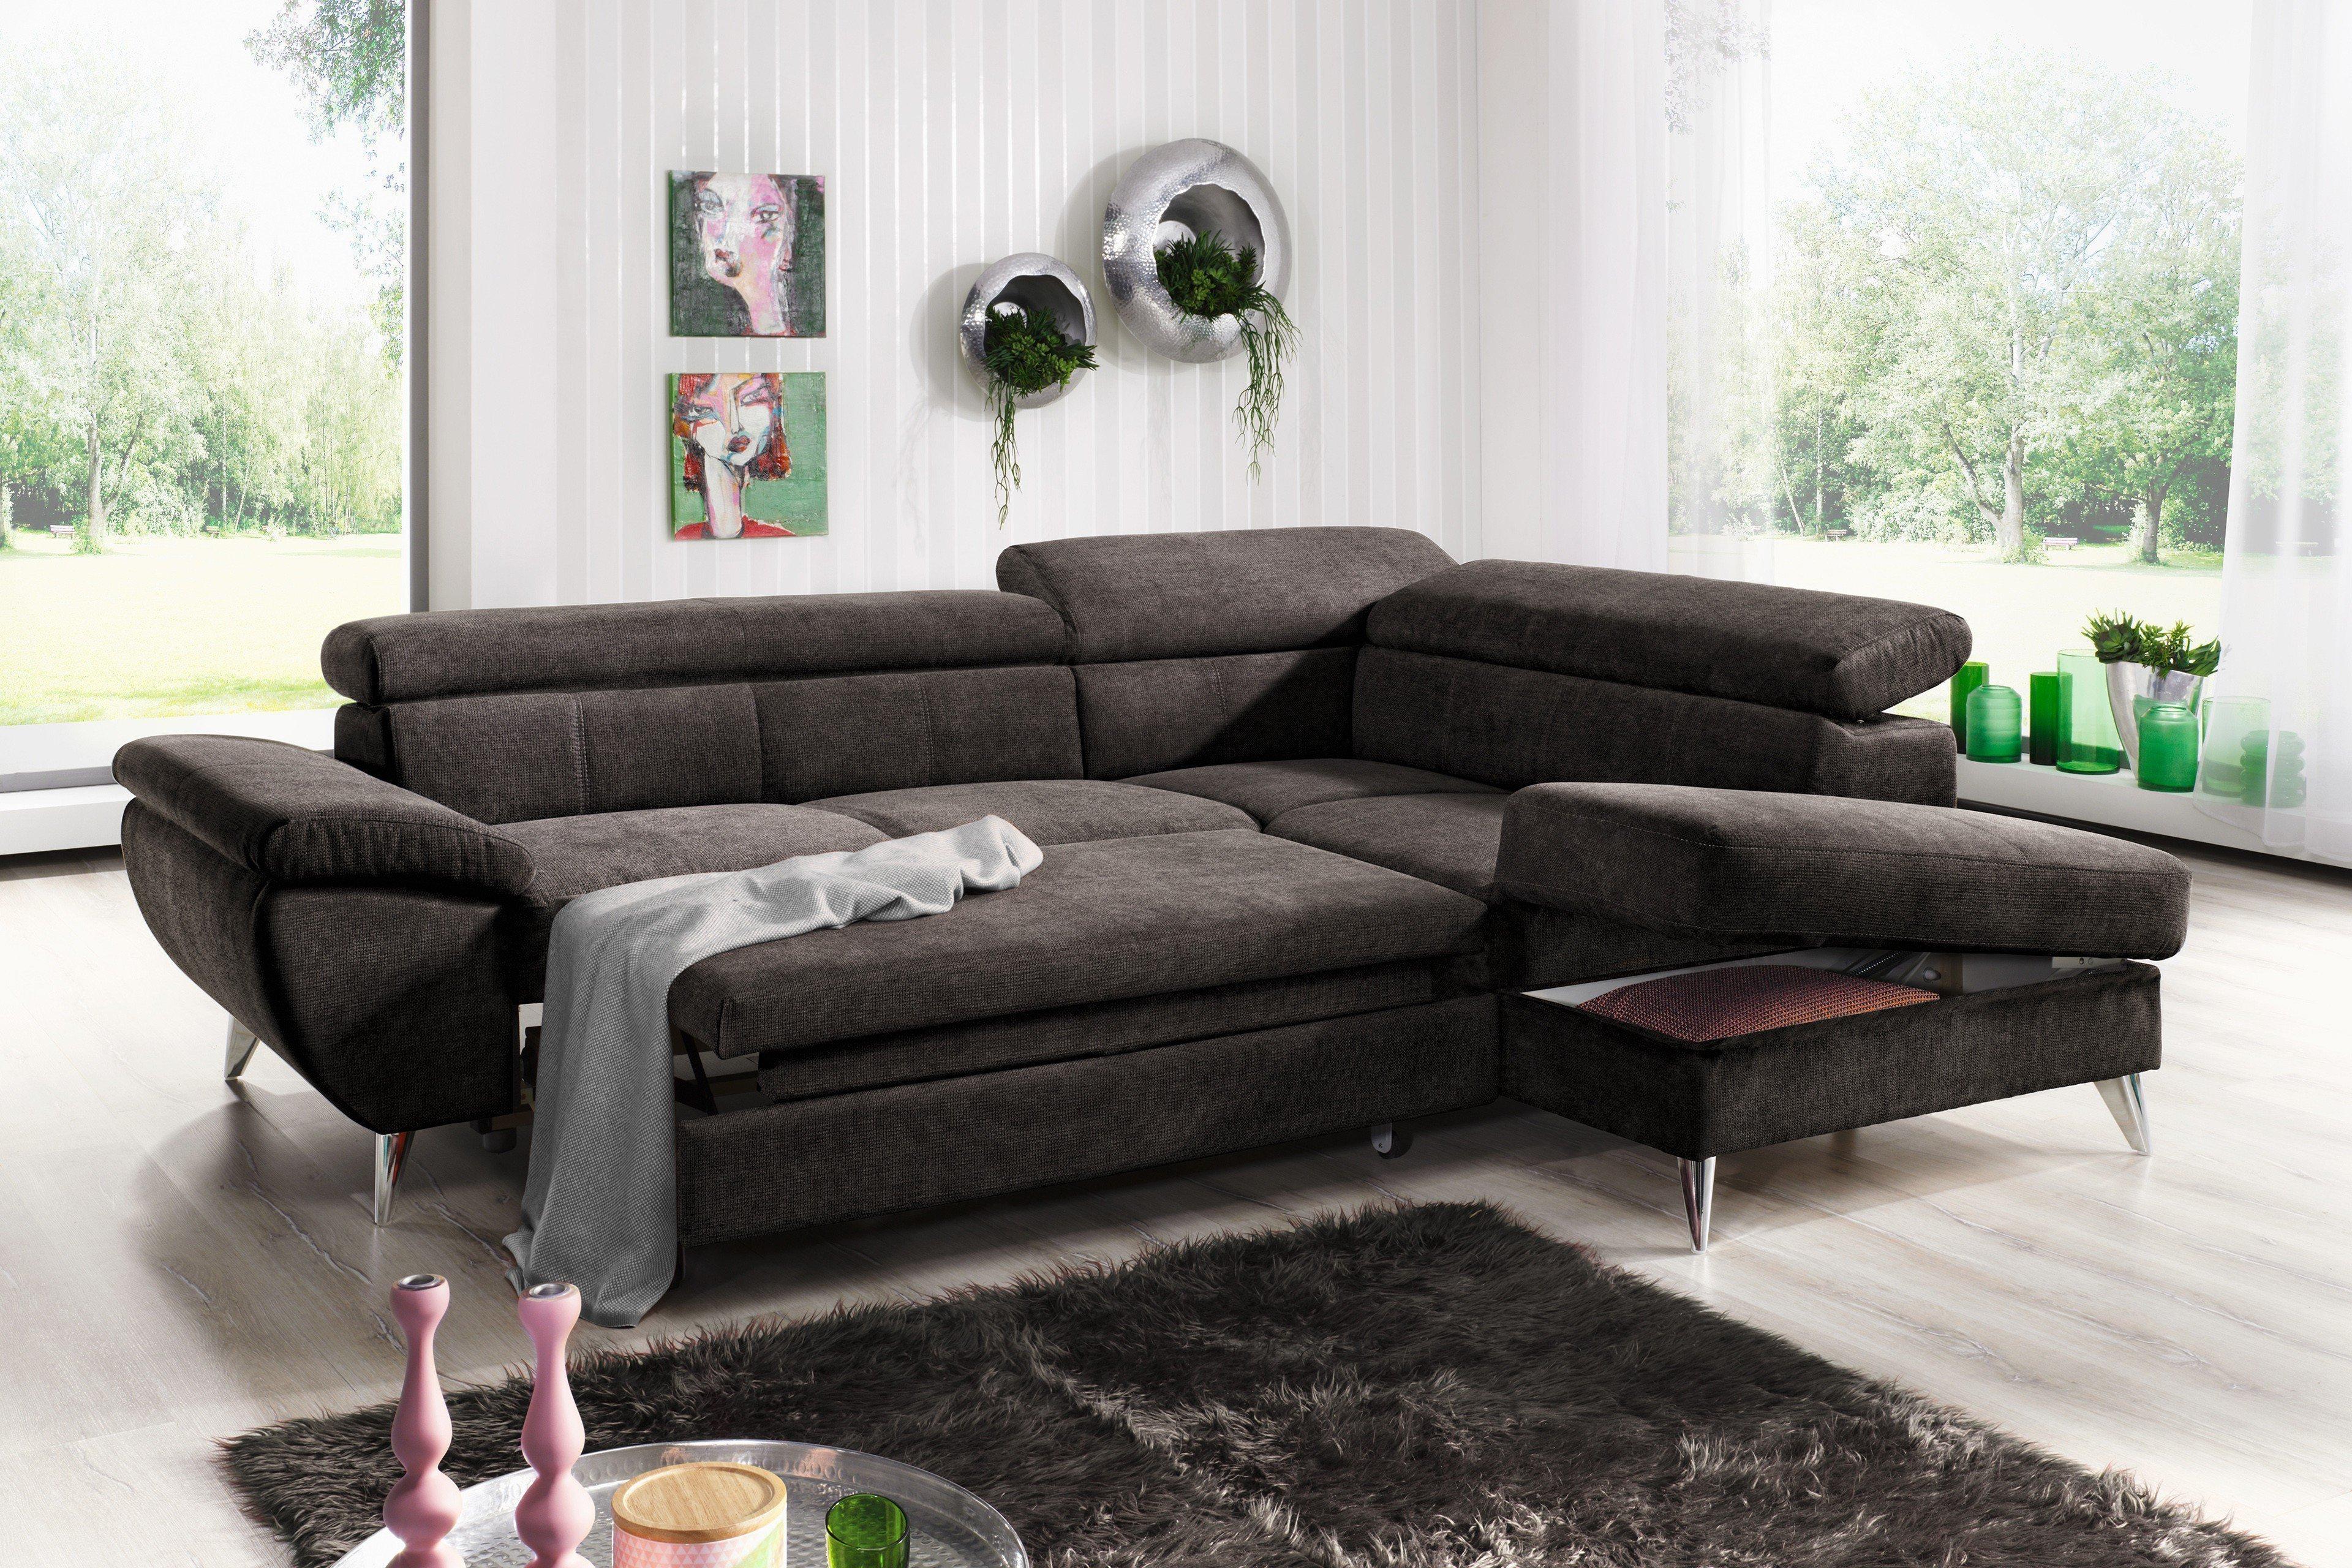 cotta finca eckgarnitur in dunkelbraun m bel letz ihr online shop. Black Bedroom Furniture Sets. Home Design Ideas